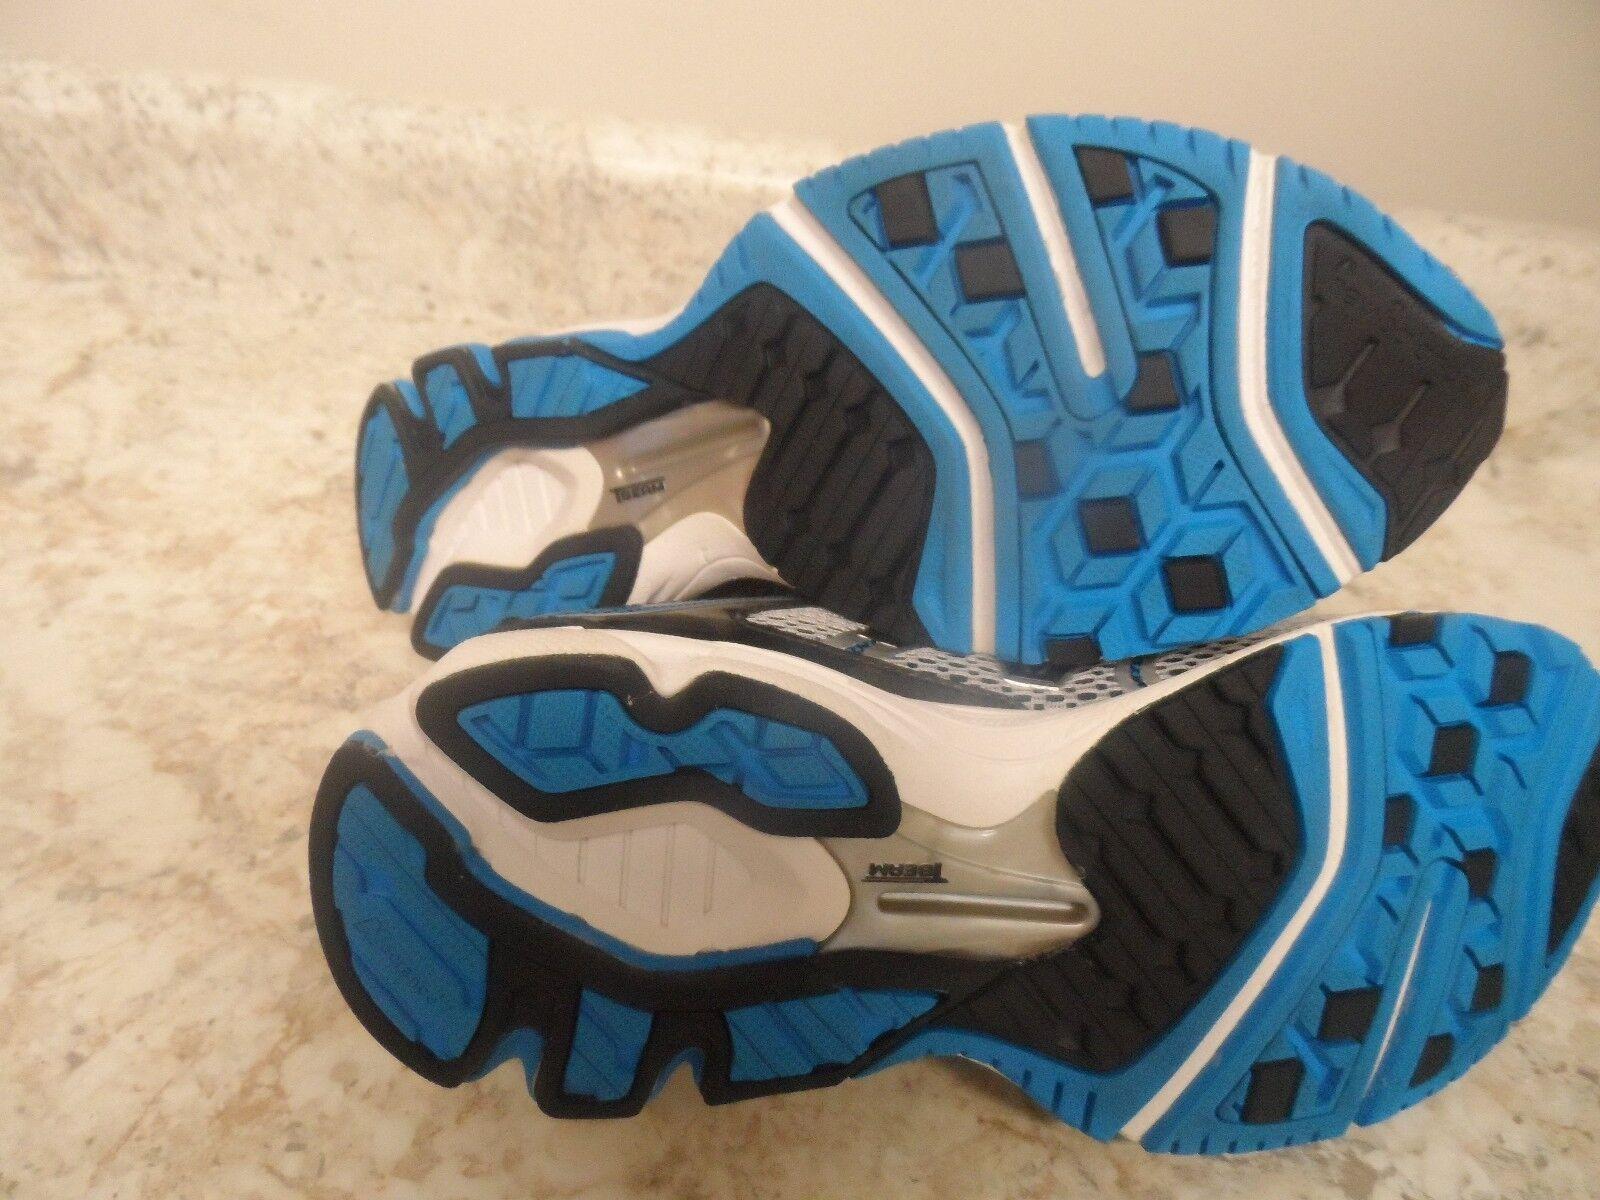 New Balance Uomo Running Running Running Shoes M880WB2 (56429-2 JO) 24253d